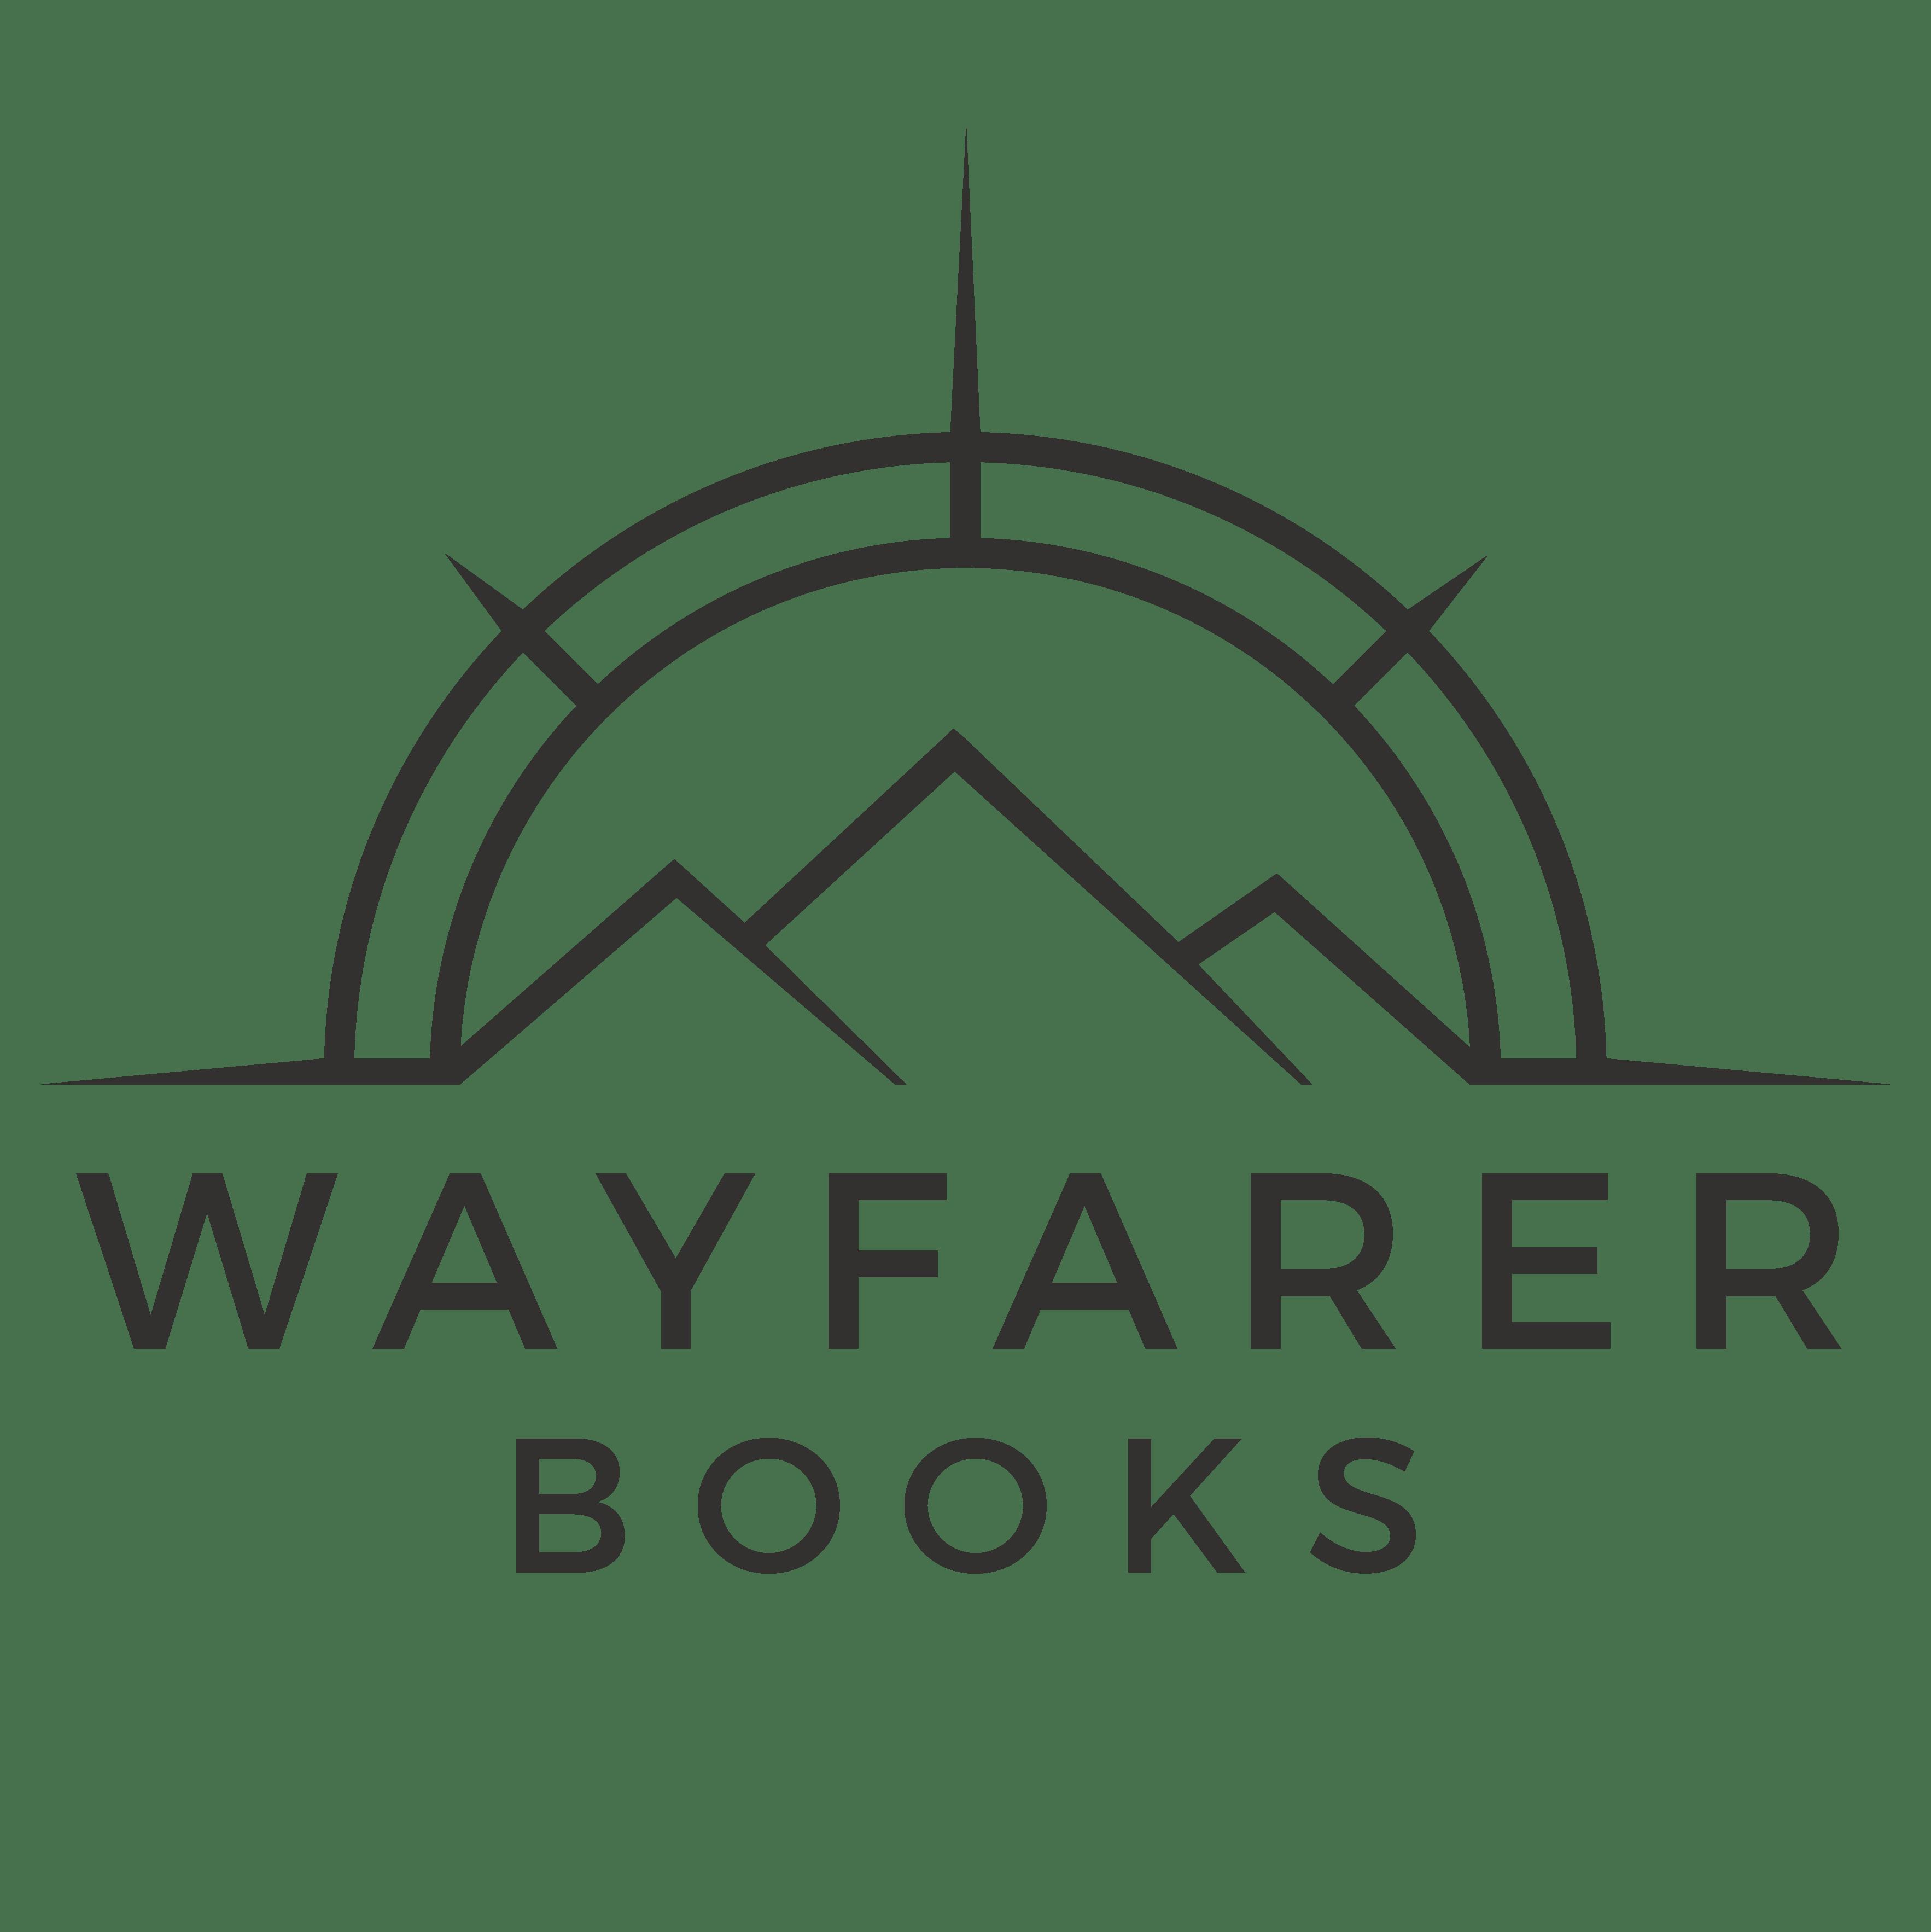 Wayfarer_Books